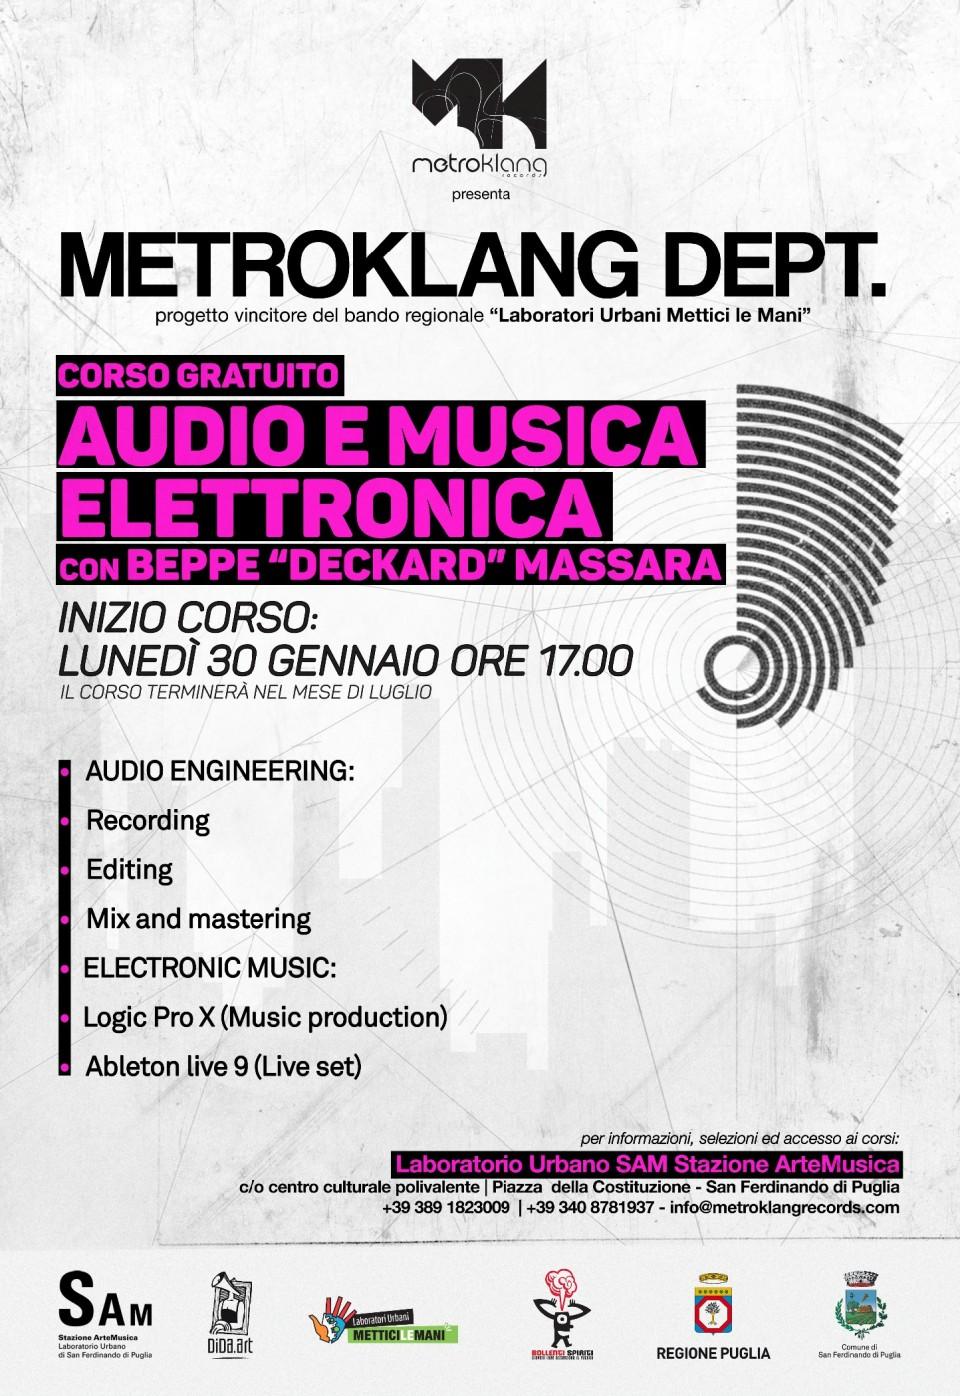 METROKLANG_Audio_musicaelettronica_web